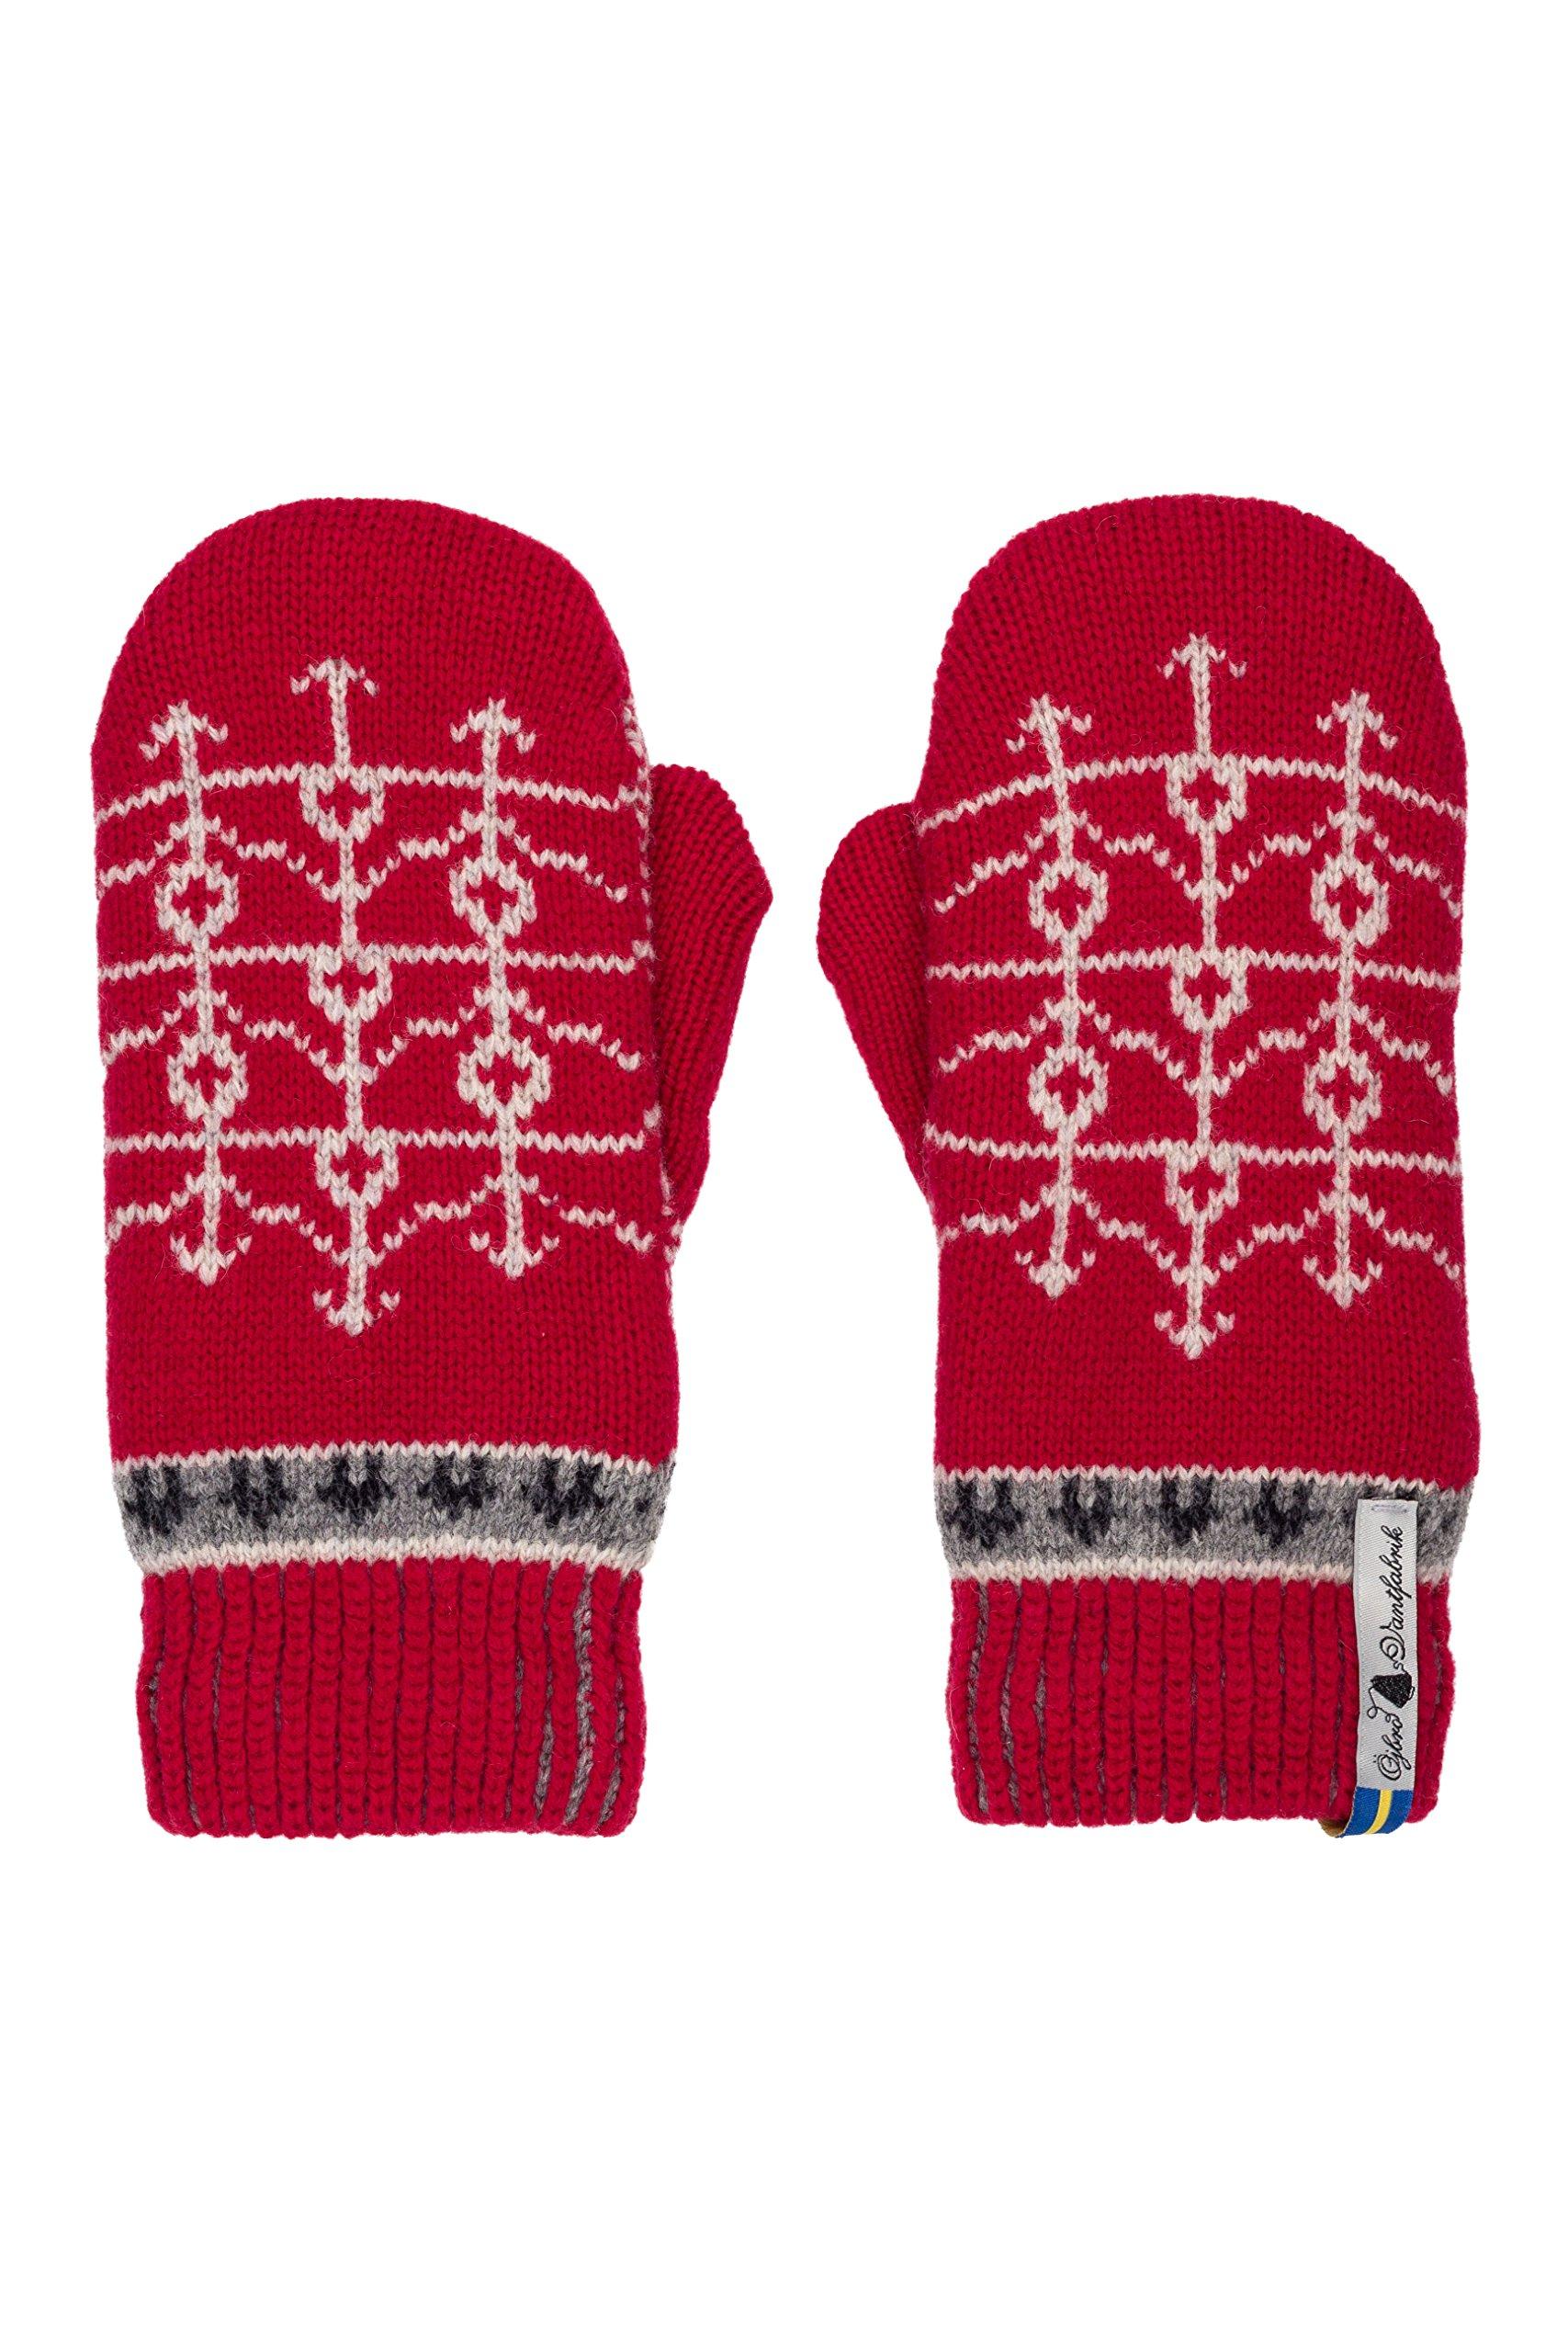 Öjbro Swedish made 100% Merino Wool Soft Thick & Extremely Warm Mittens (Medium, Ekshärad Röd)